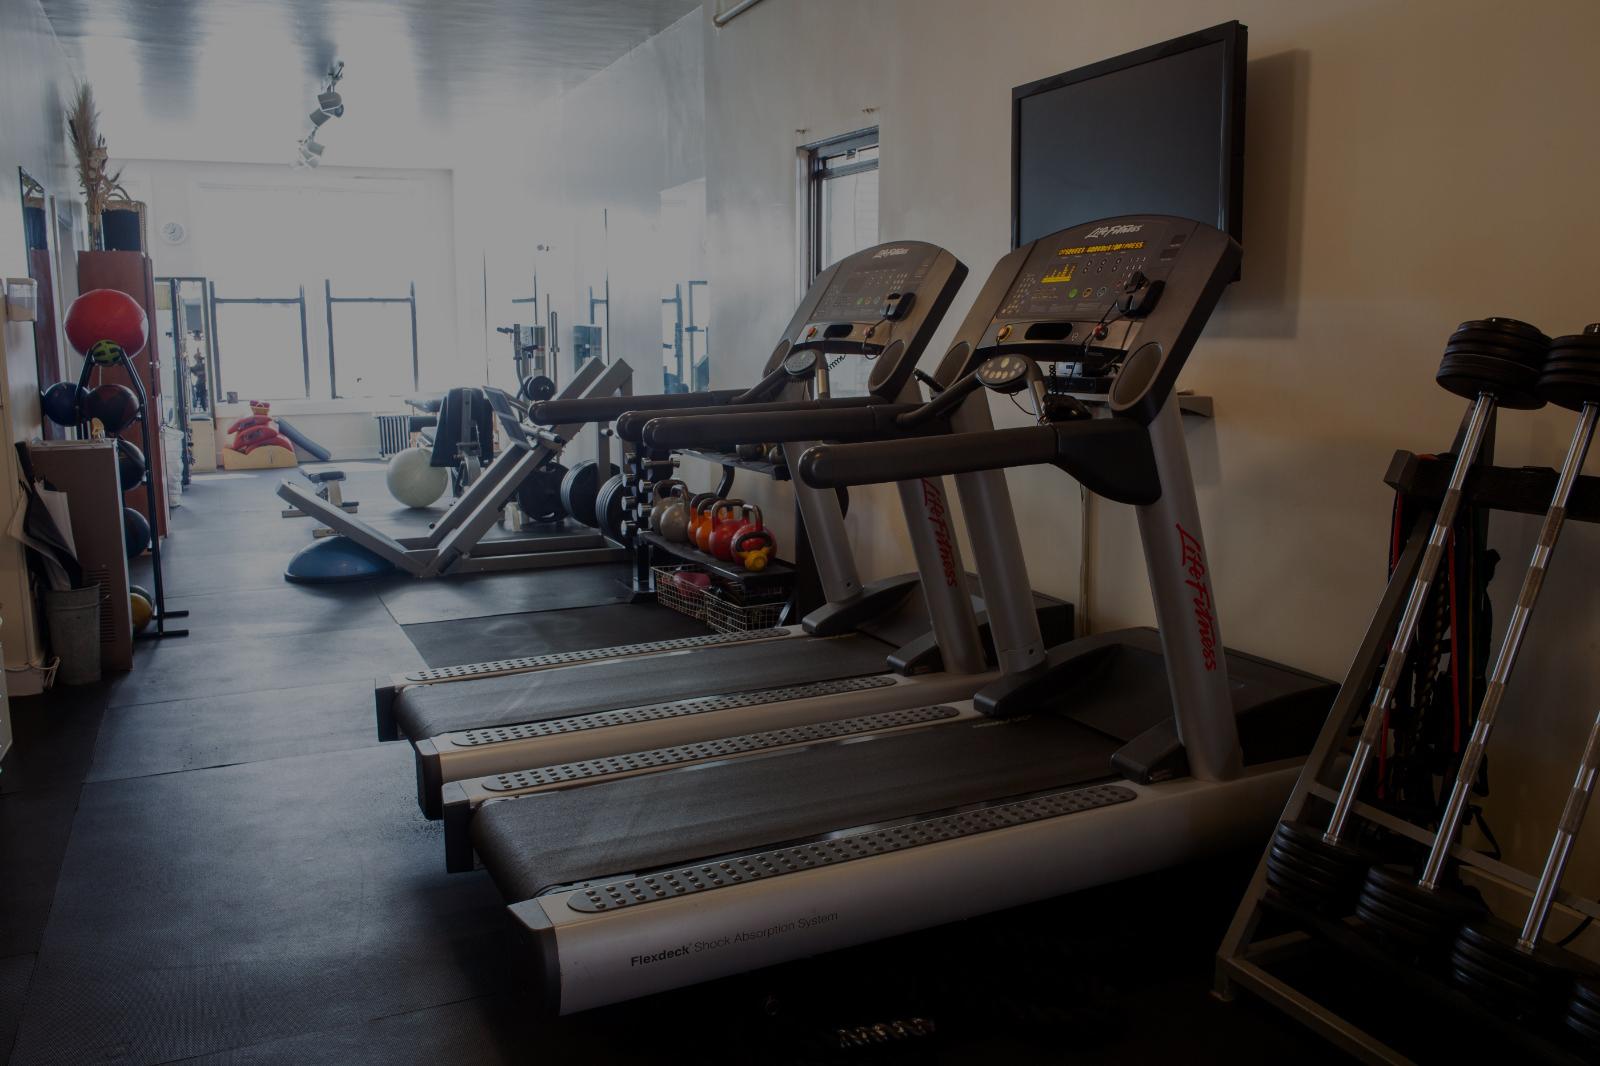 Dakota Personal Training & Pilates, Personal Training, Semi-Private Training, Pilates, Upper West Side